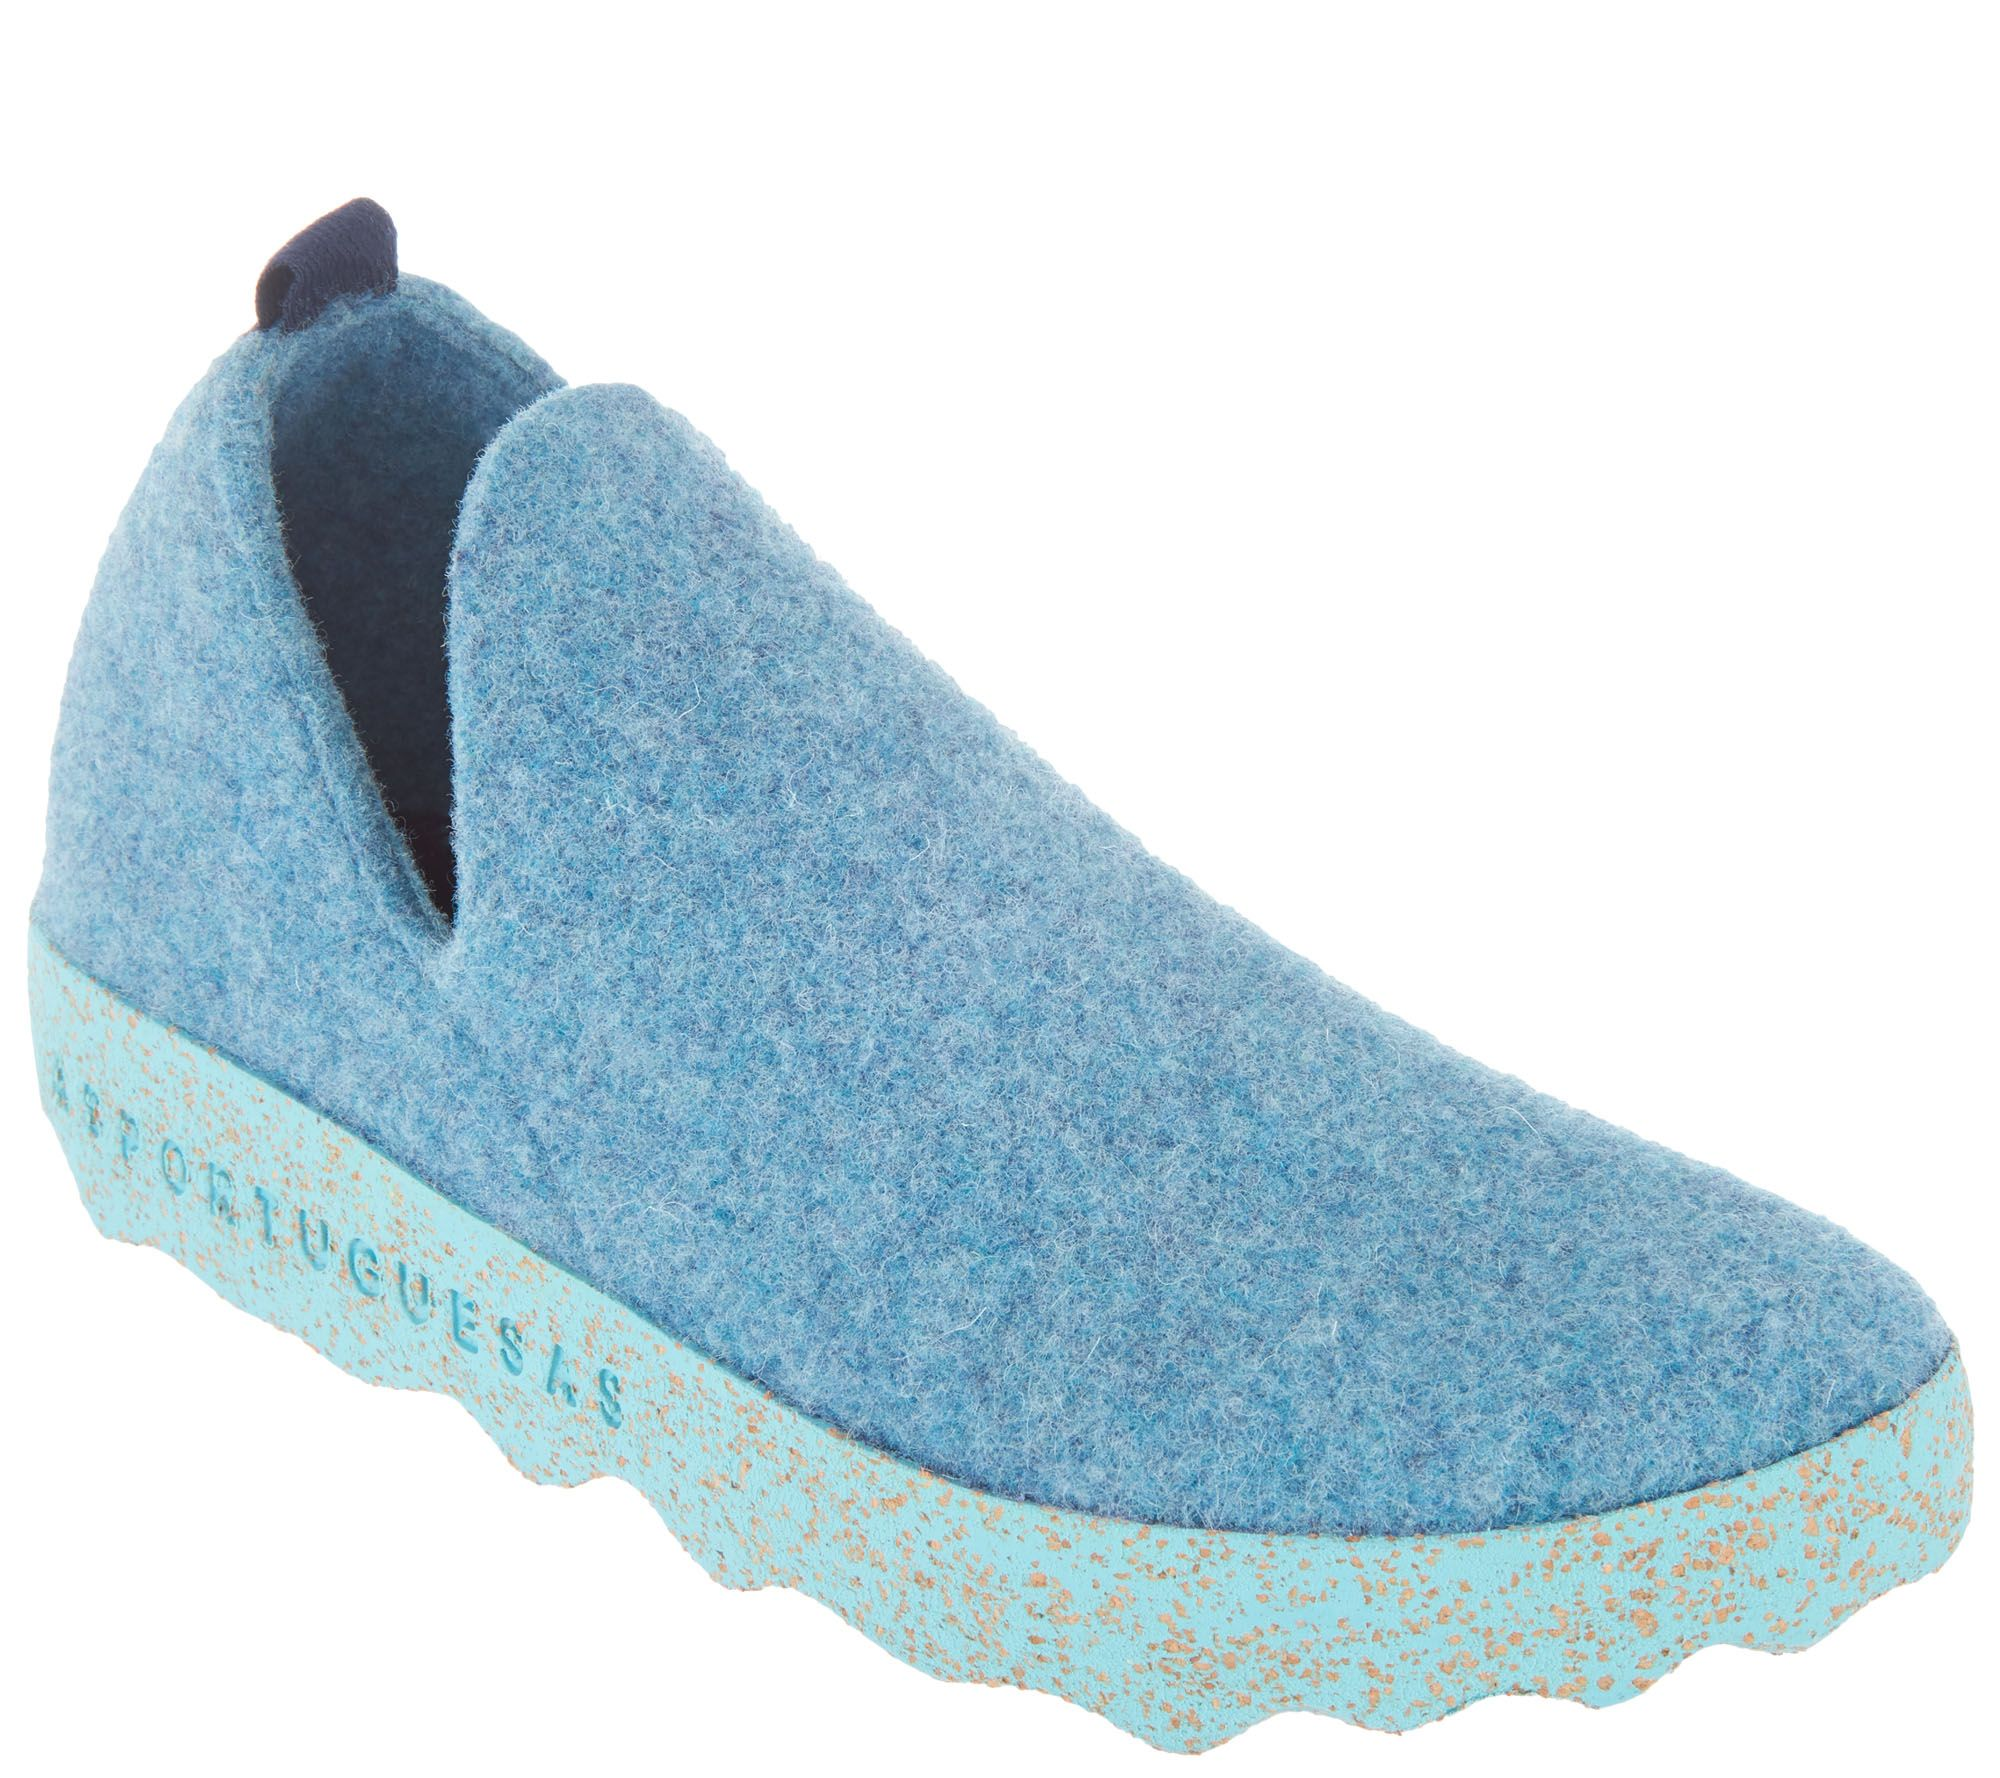 85a539b99825a Asportuguesas by Fly London Boiled Wool Slip-on Shoes — QVC.com